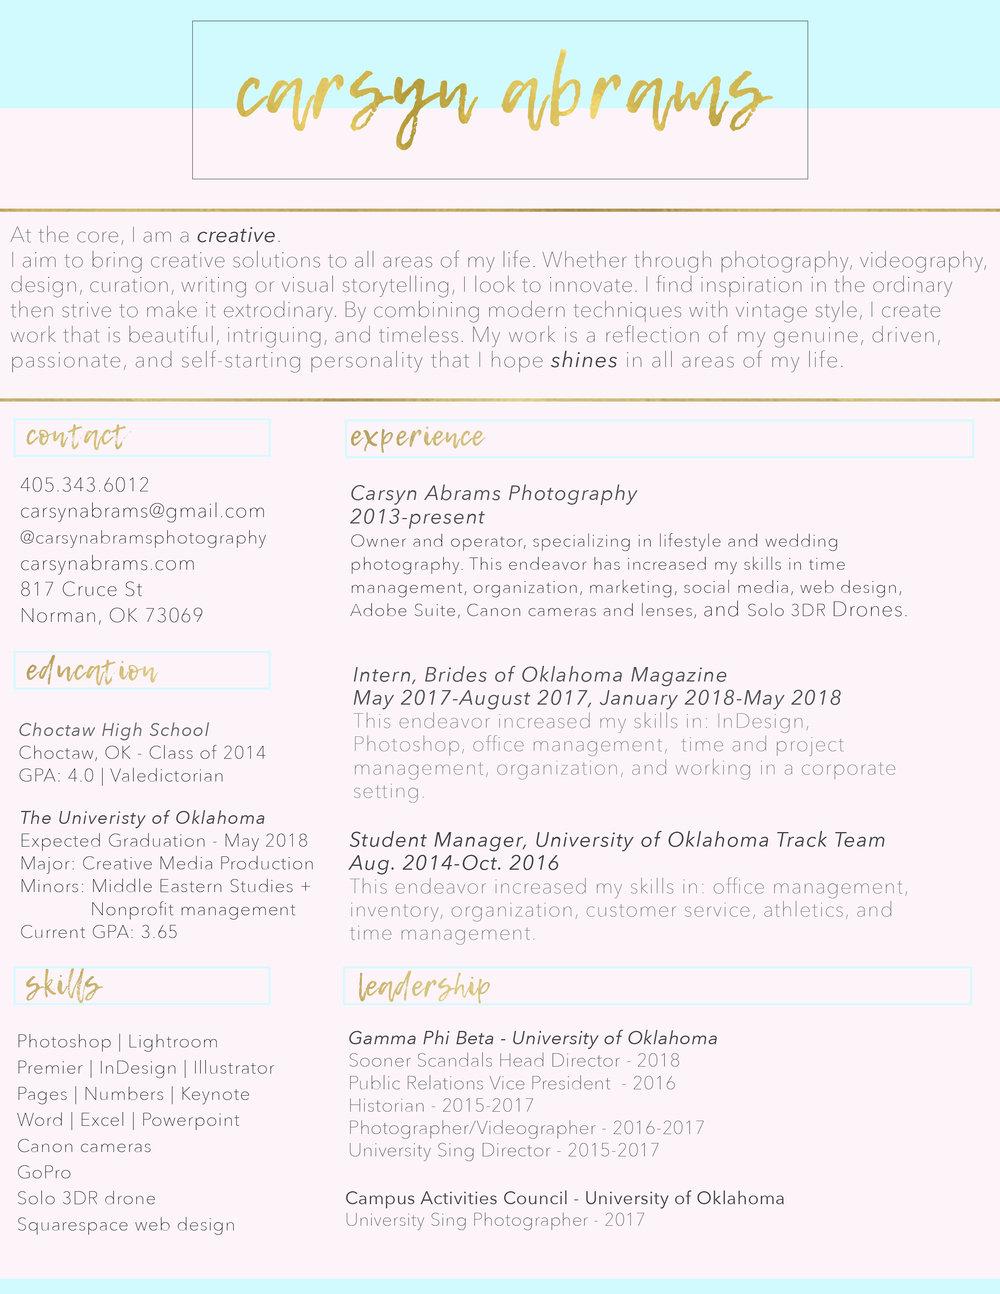 abrams-resume.jpg